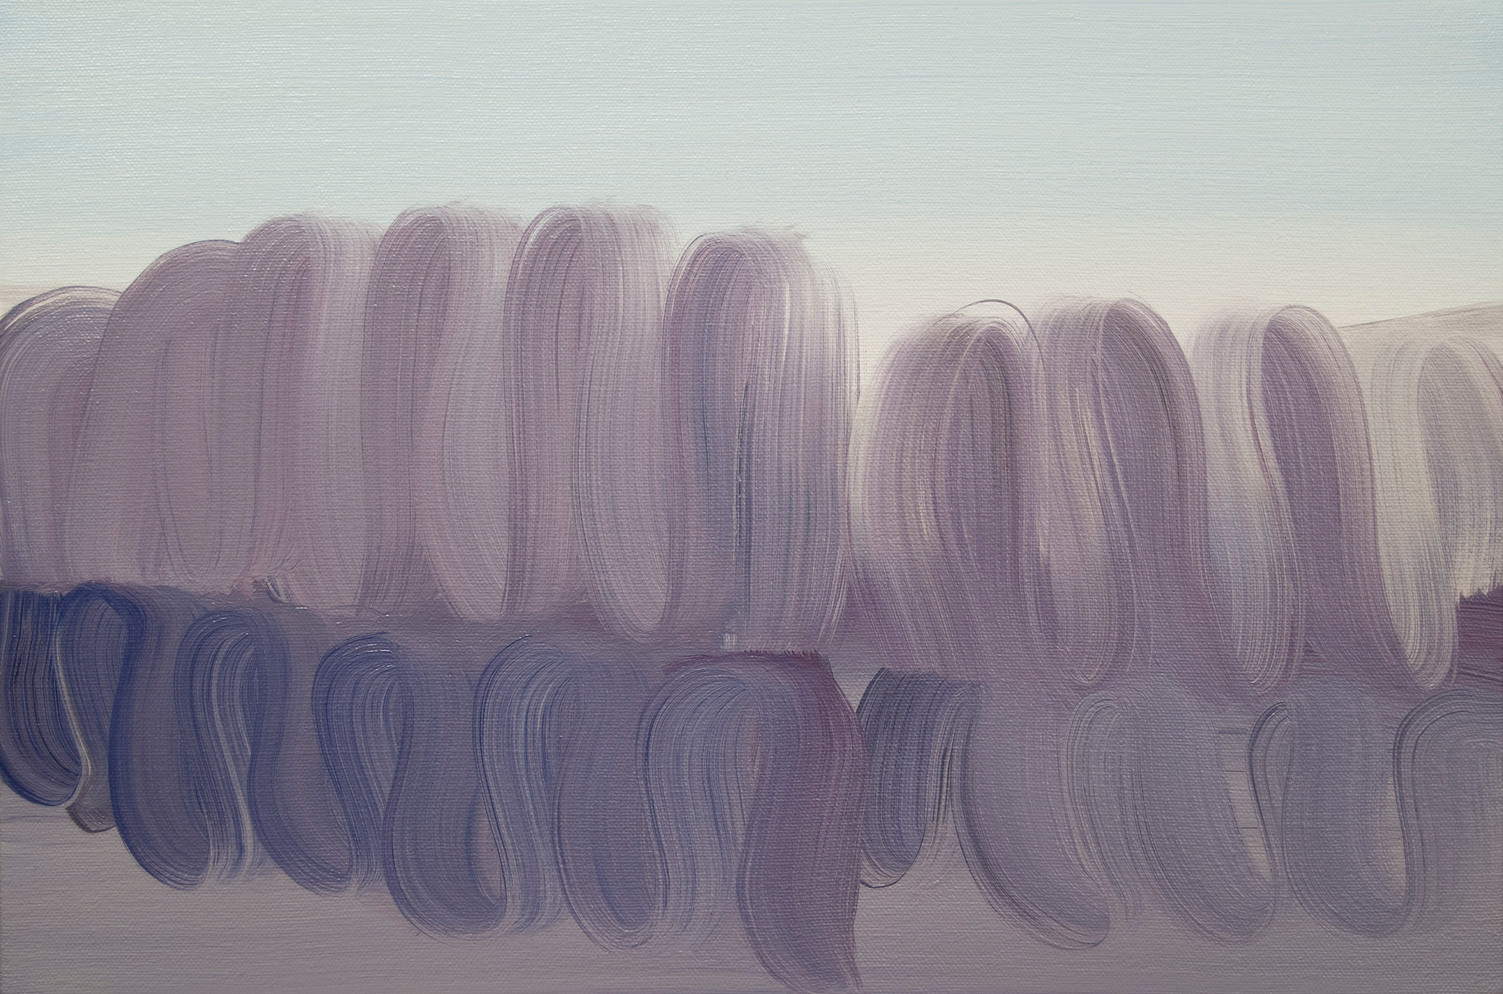 Mimic, 2015, oil on canvas 30 x 45 cm  • Available